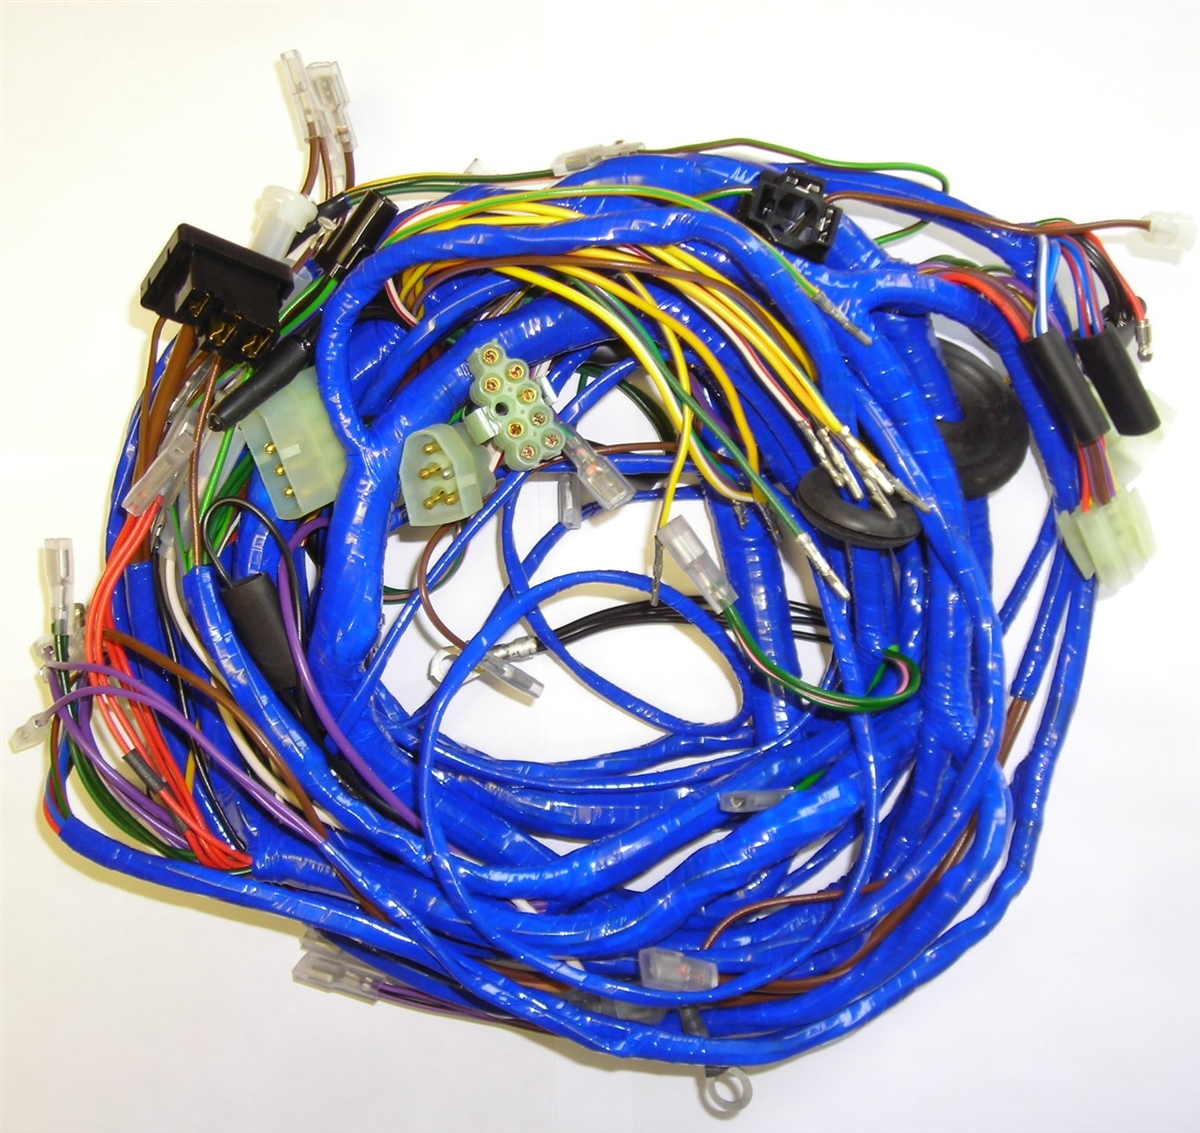 hight resolution of main wiring harness mg midget 1978 mg midget wiring harness mg midget wiring harness